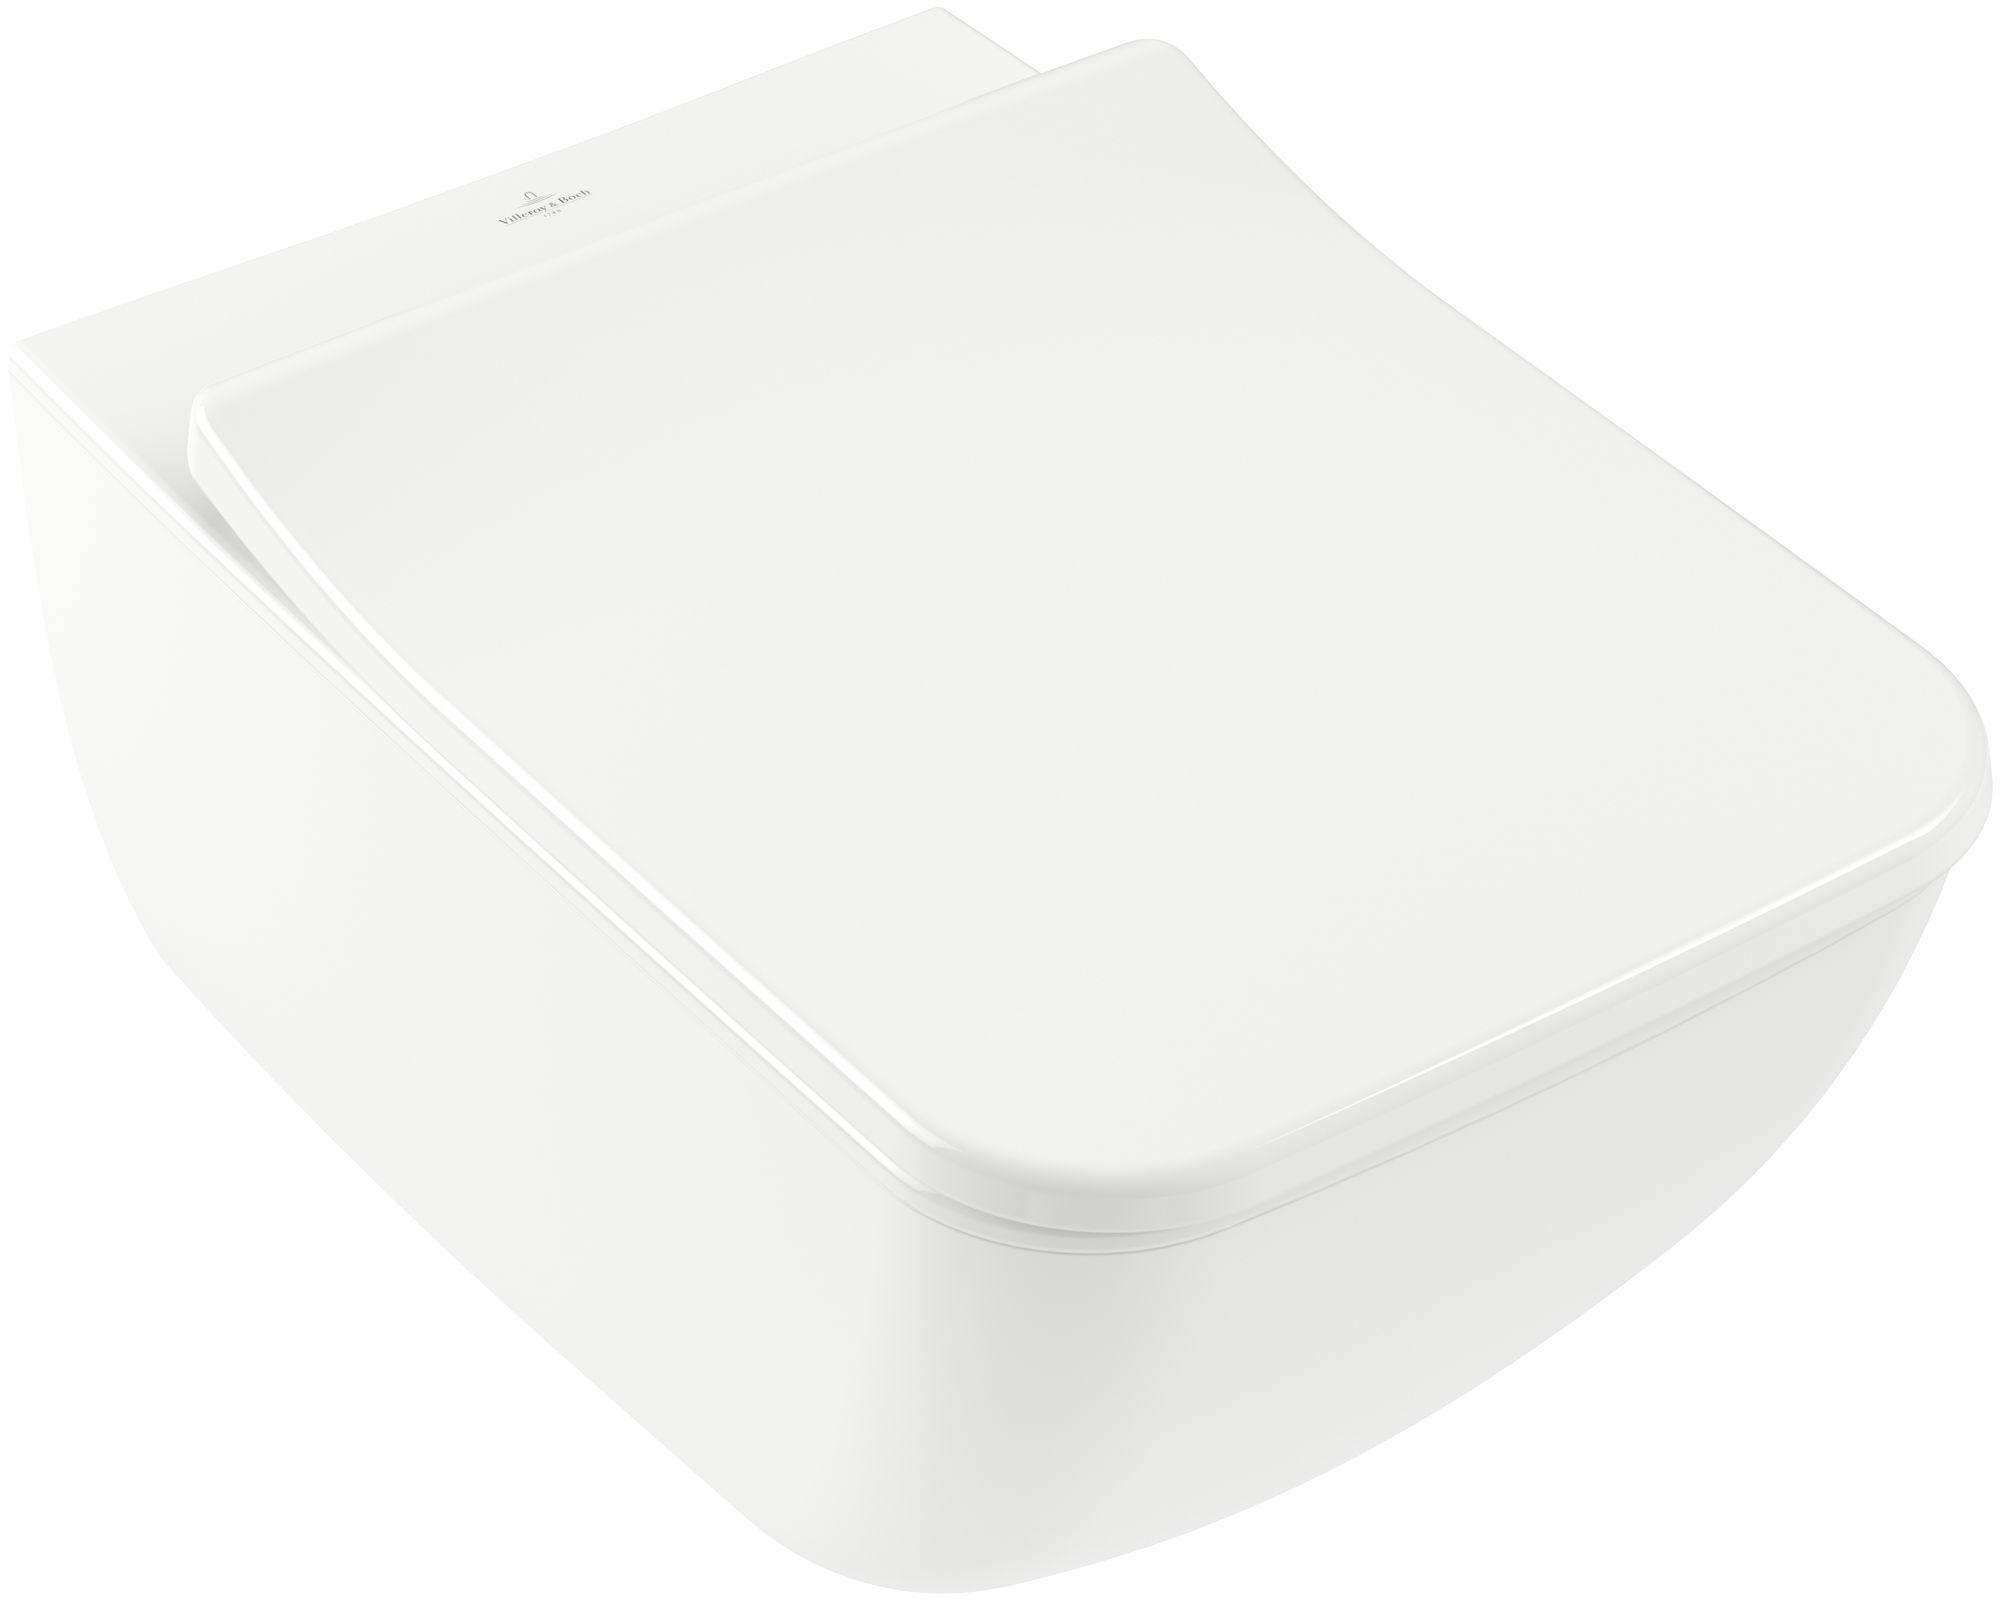 Villeroy & Boch Venticello Wand-Tiefspül-WC Combi-Pack DirectFlush mit offenem Spülrand L:56 B:37,5cm weiß 4611RS01